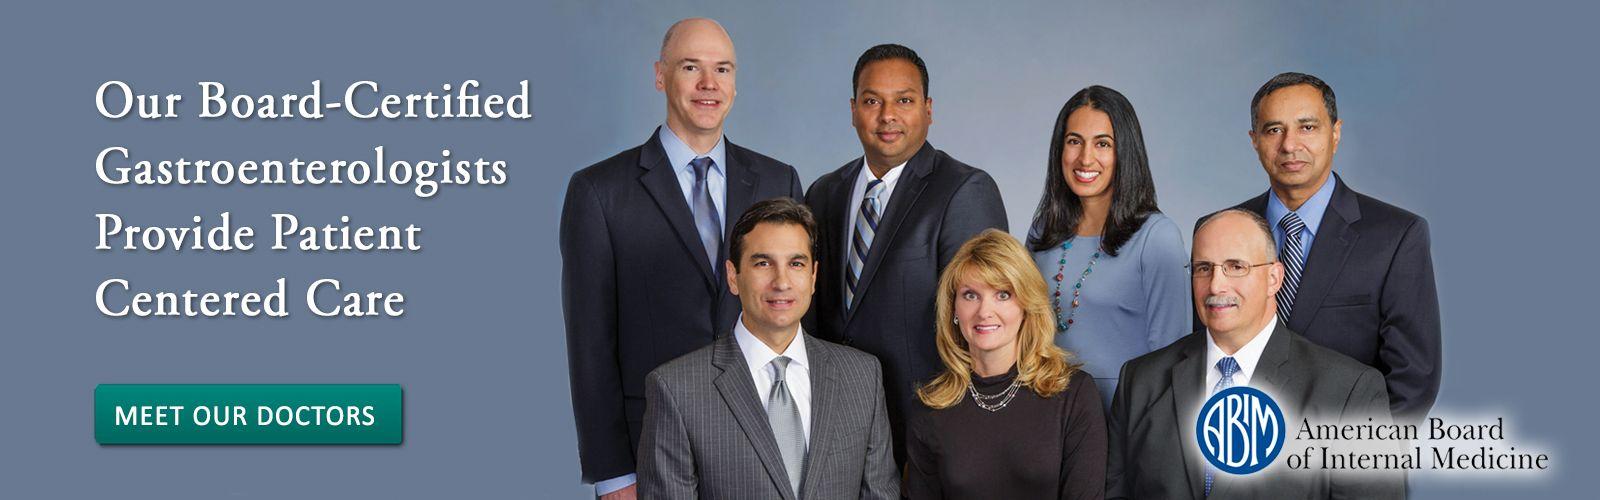 PA-GI-Meet-Our-Doctors-Banner-Board-Certified.jpg